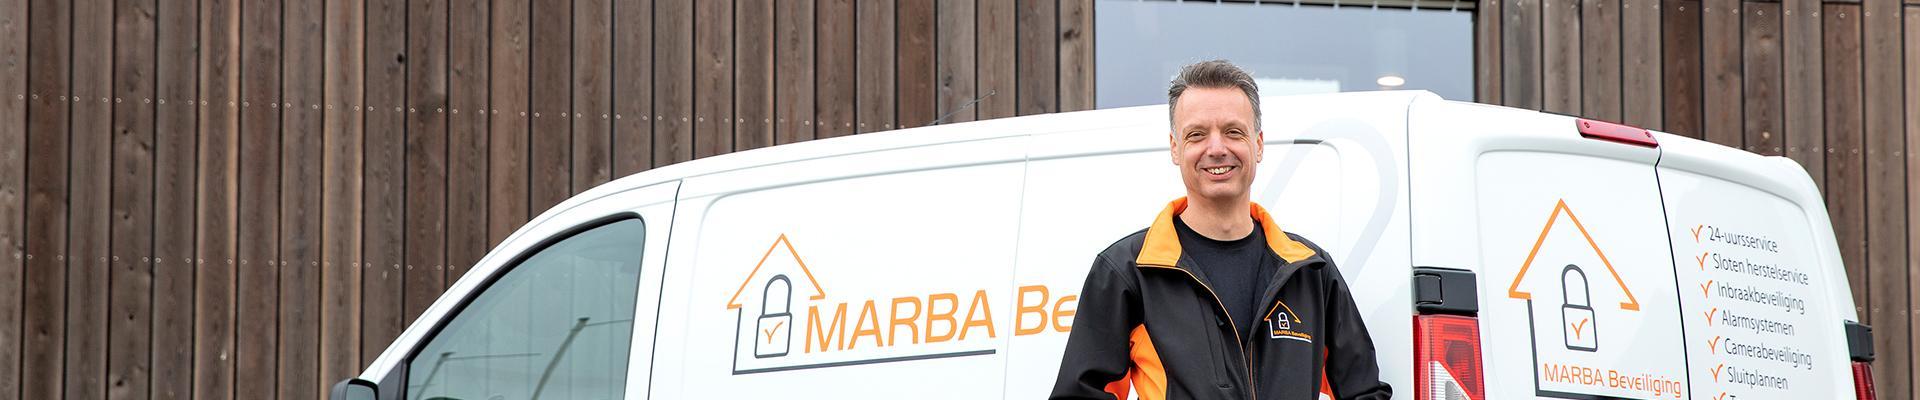 MARBA Beveiliging slot kapot